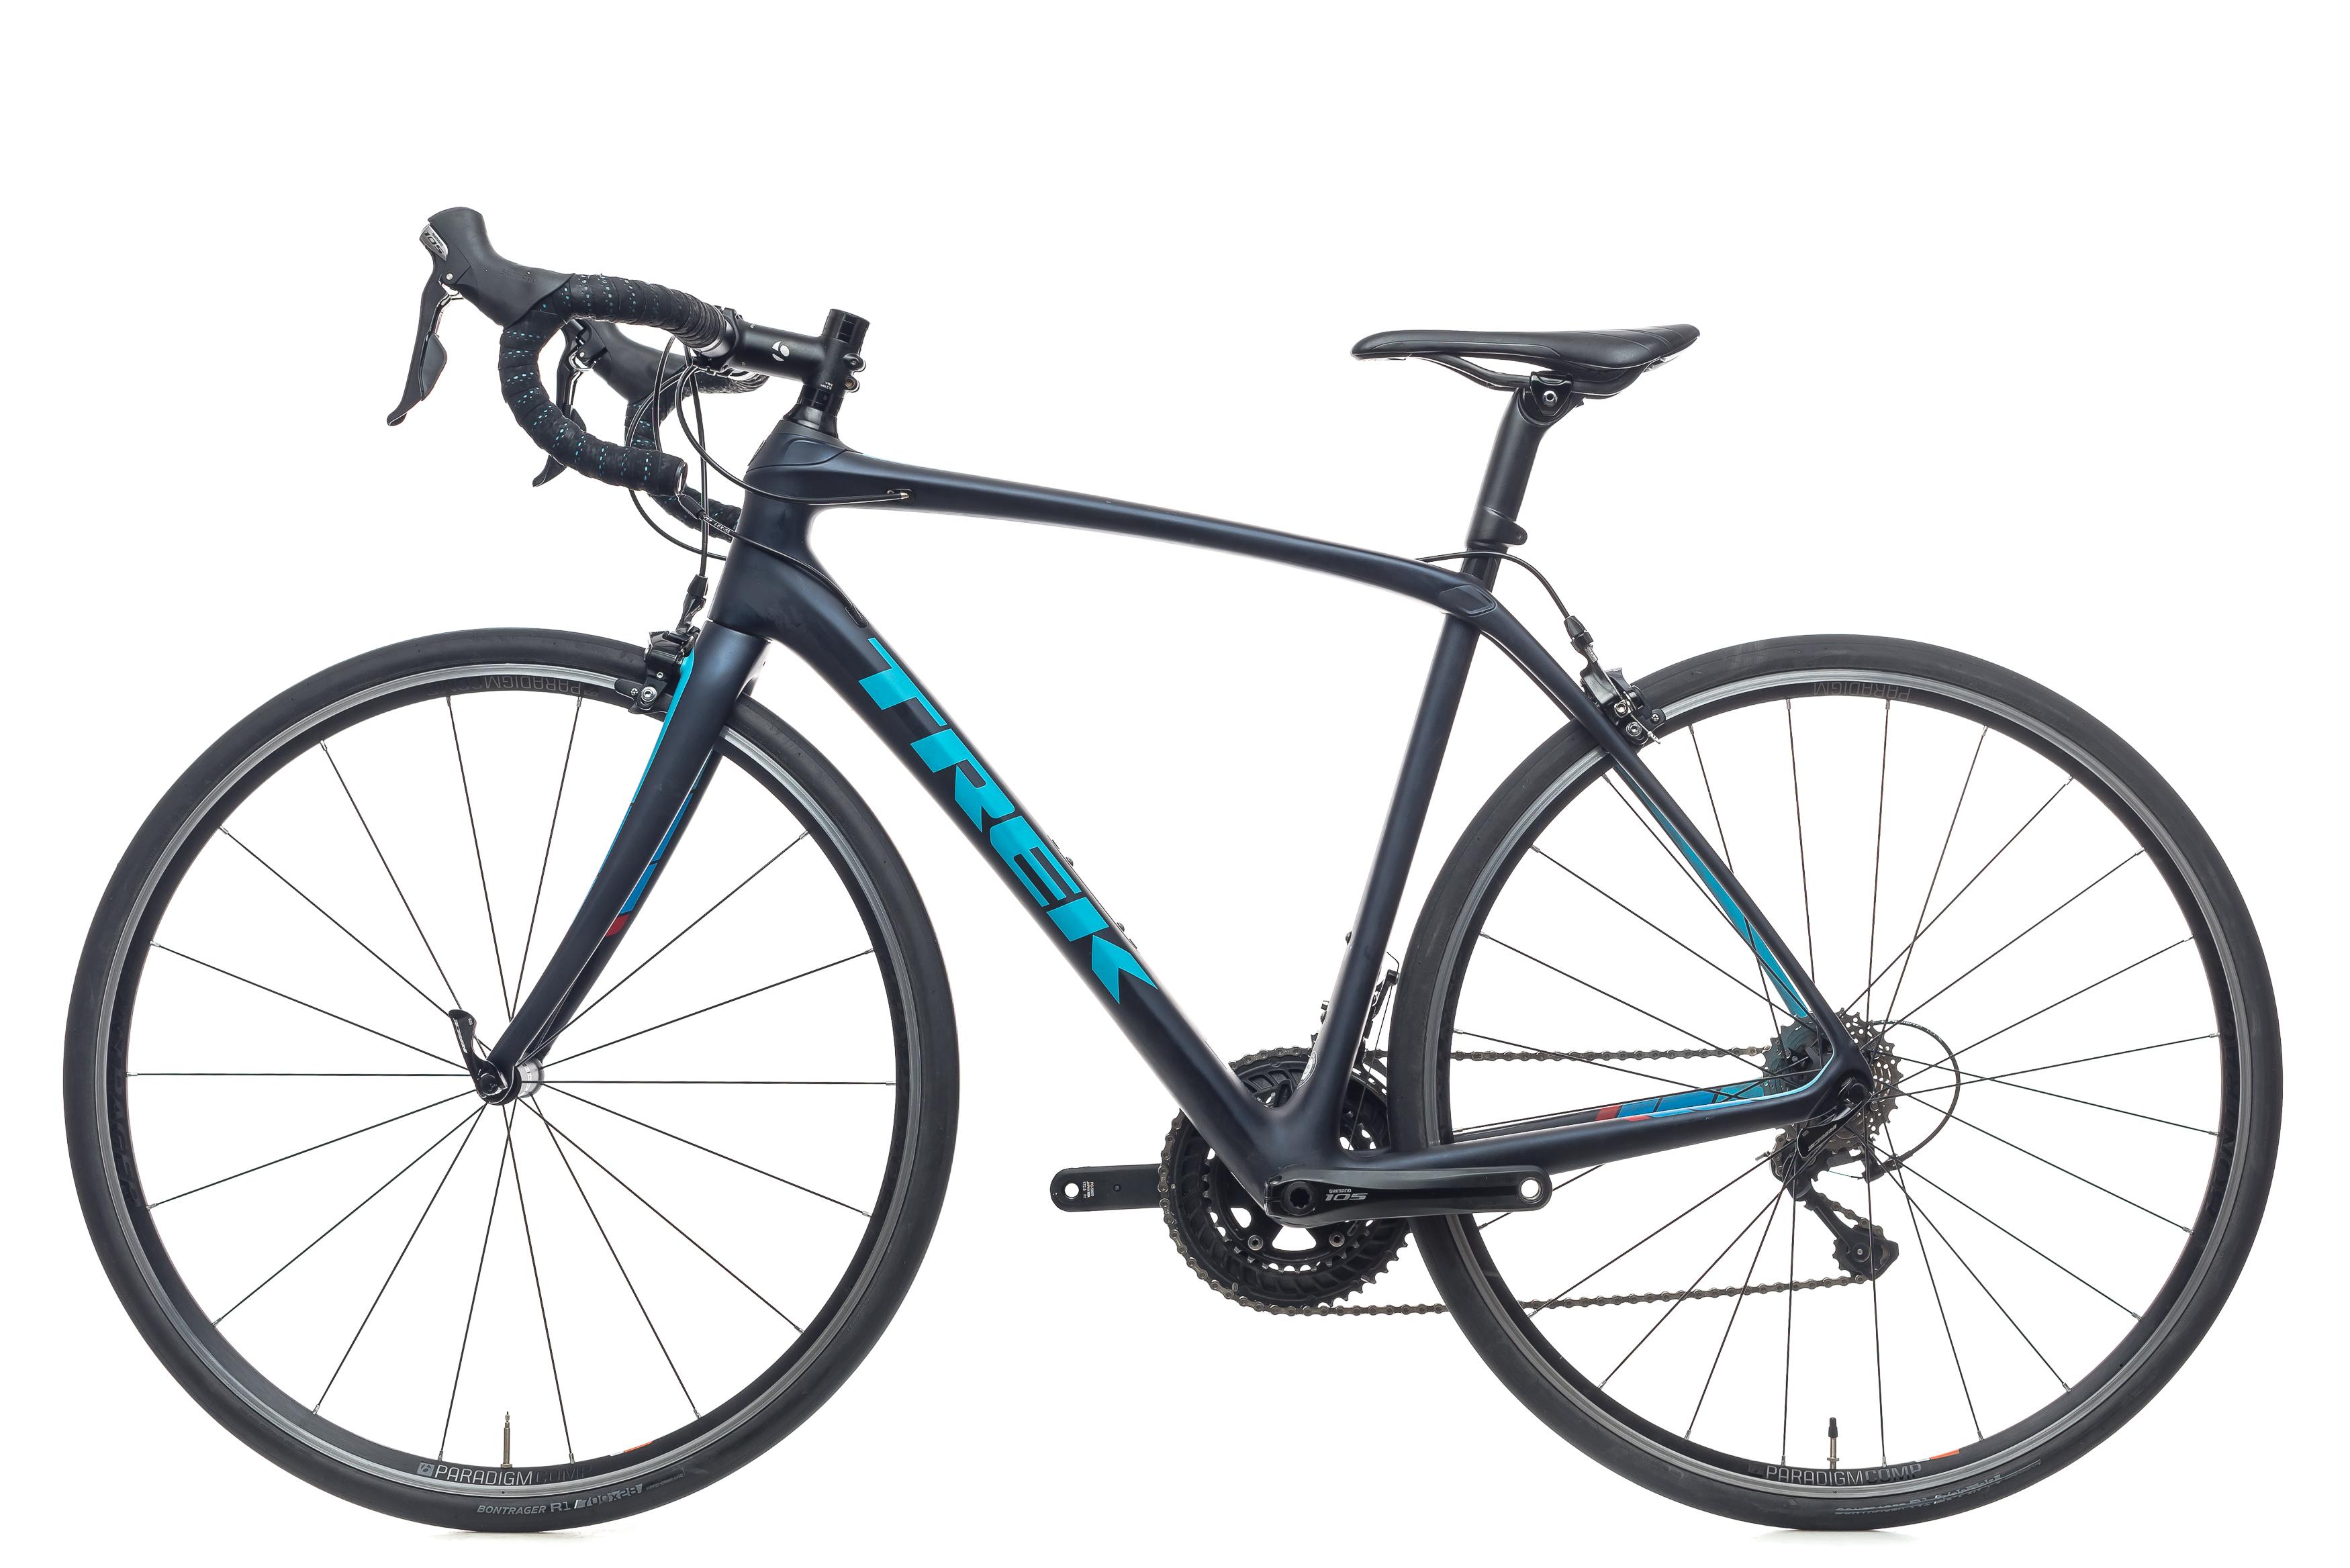 2018 Trek Domane SL5 Road Bike 54cm Medium Carbon Shimano